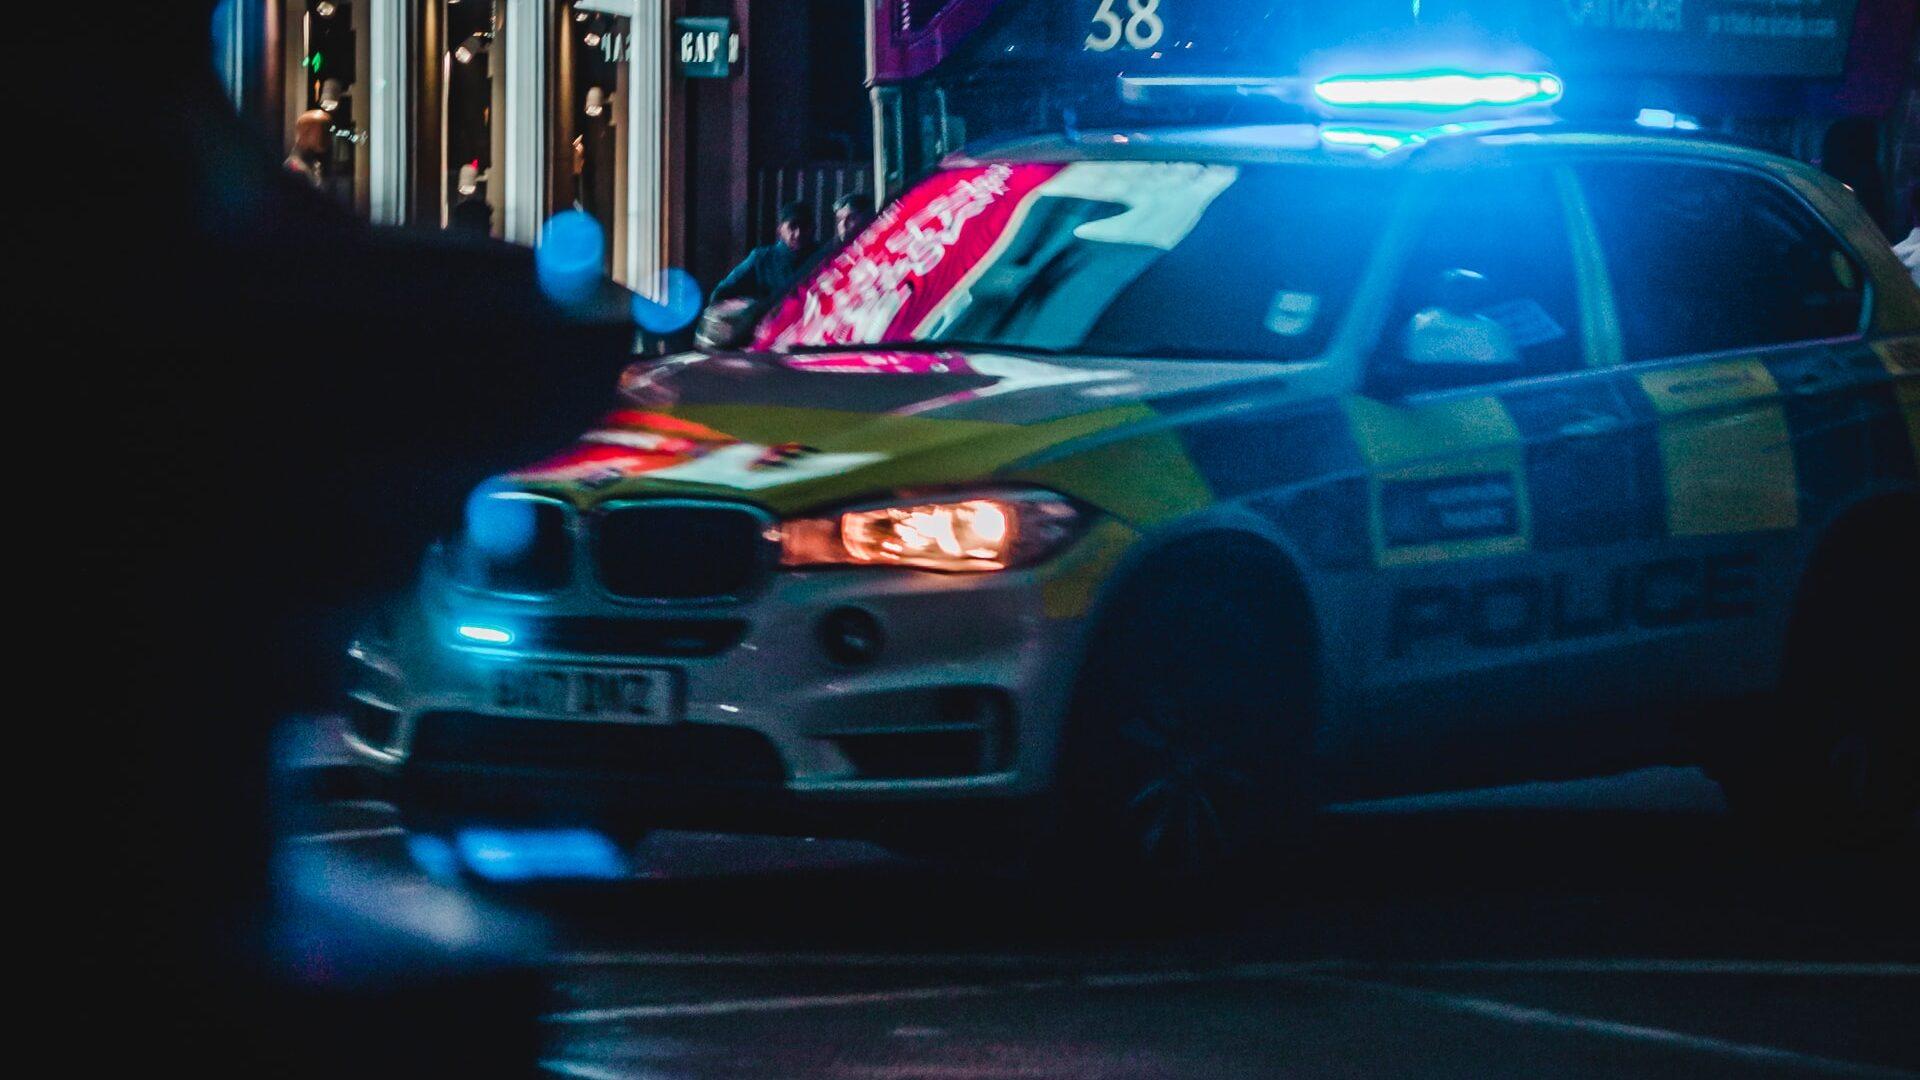 Arrested Drunk Driver Smashed Hand Battering Police Cell in Santa Paula